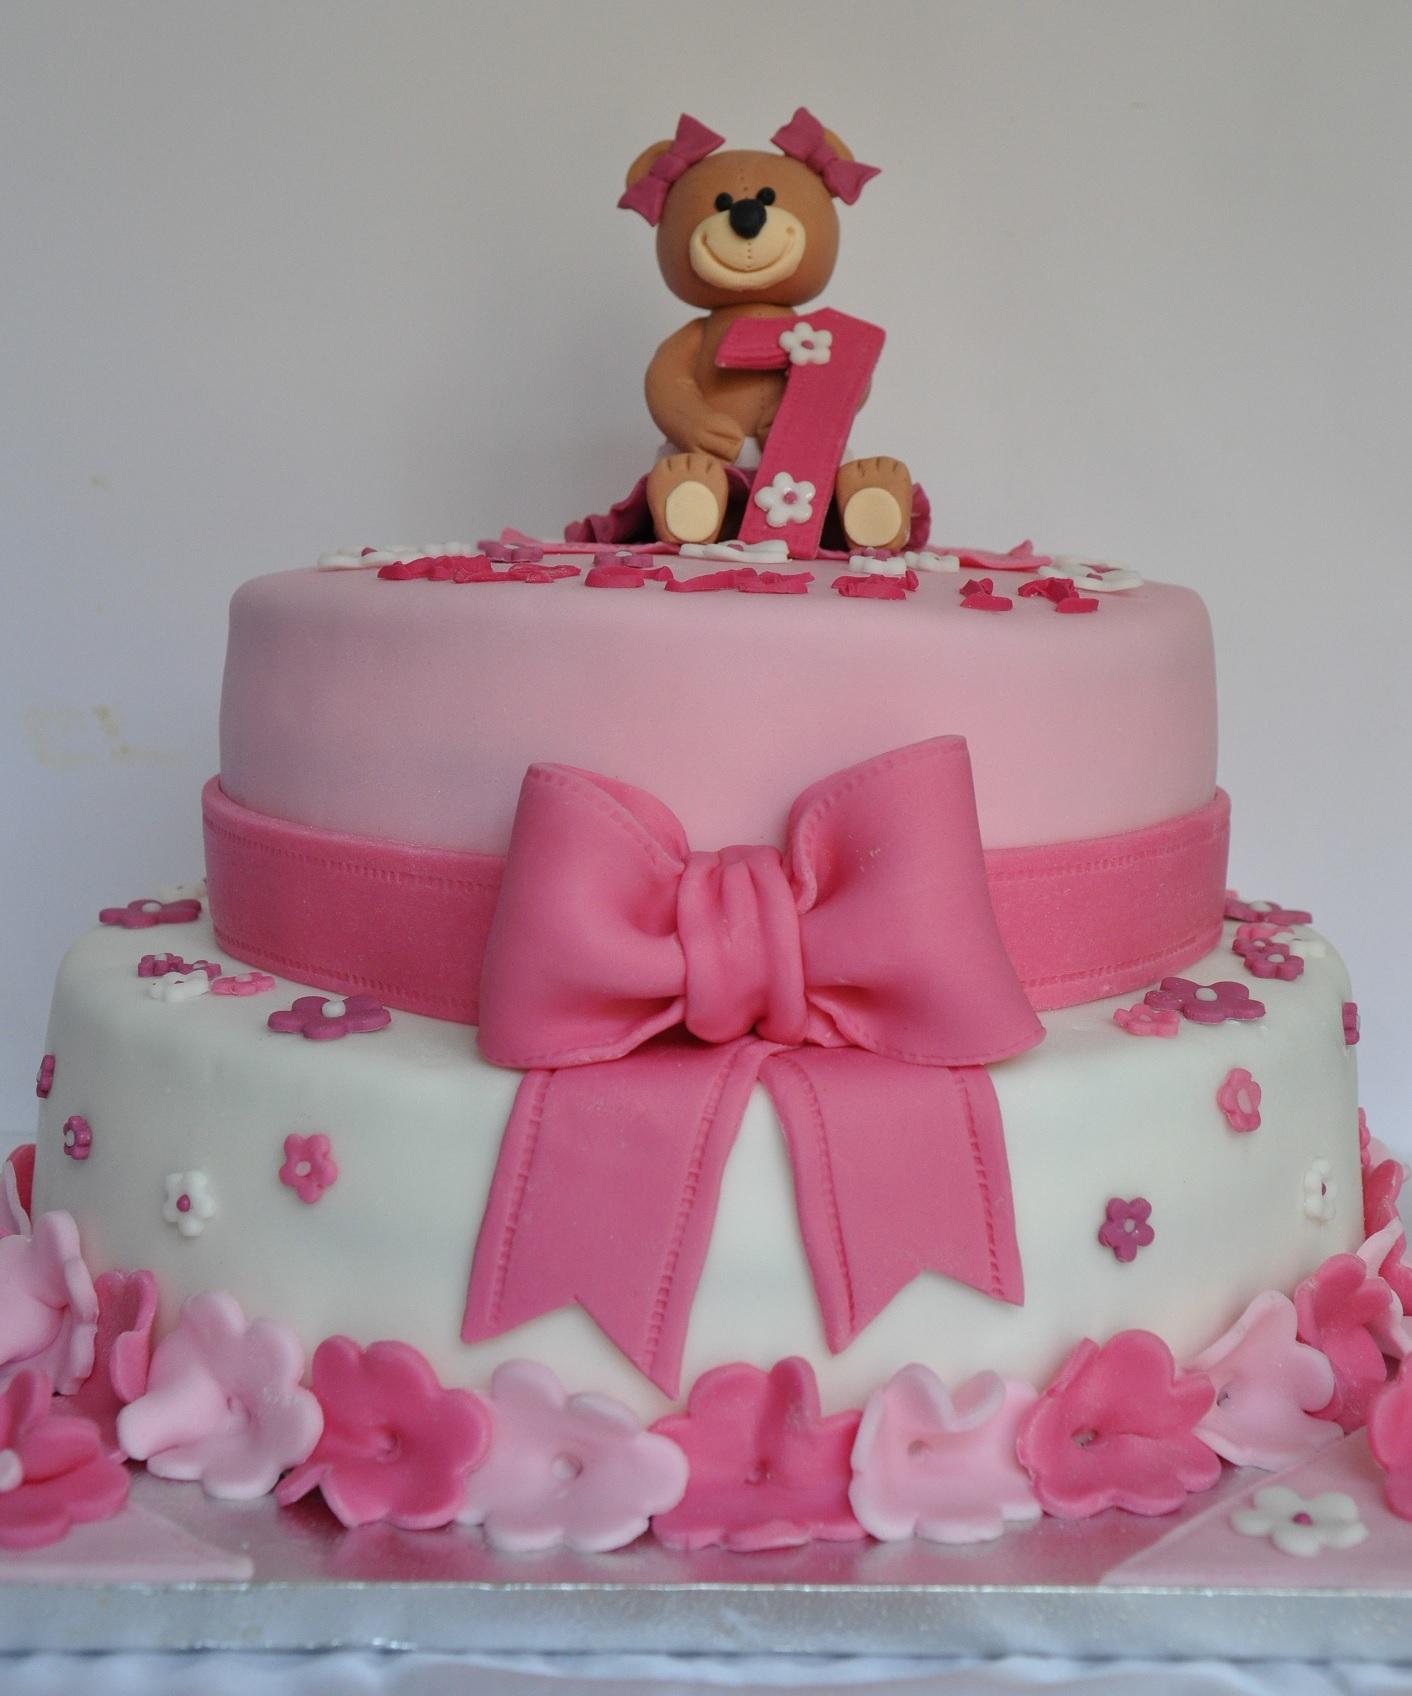 Le mie torte speciali